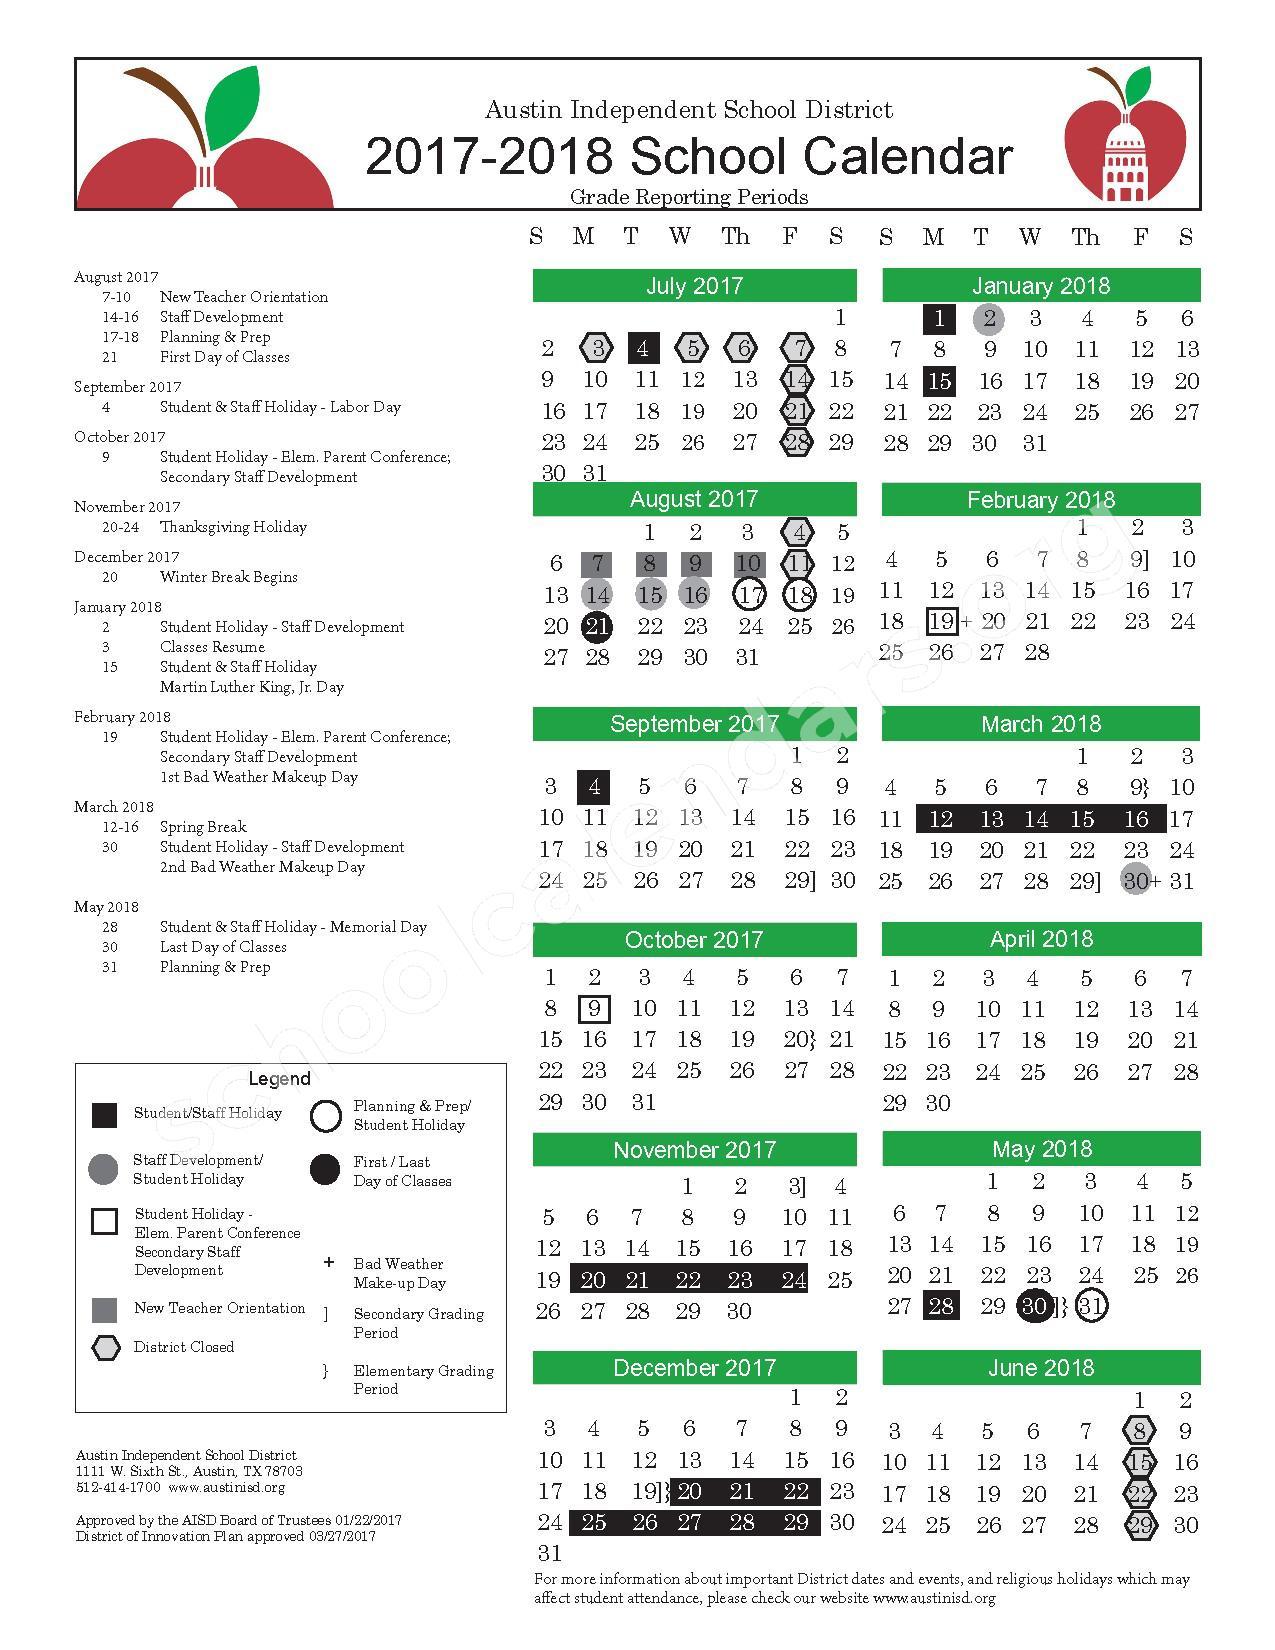 Aisd 2022 23 Calendar.A U S T I N S C H O O L D I S T R I C T C A L E N D A R Zonealarm Results